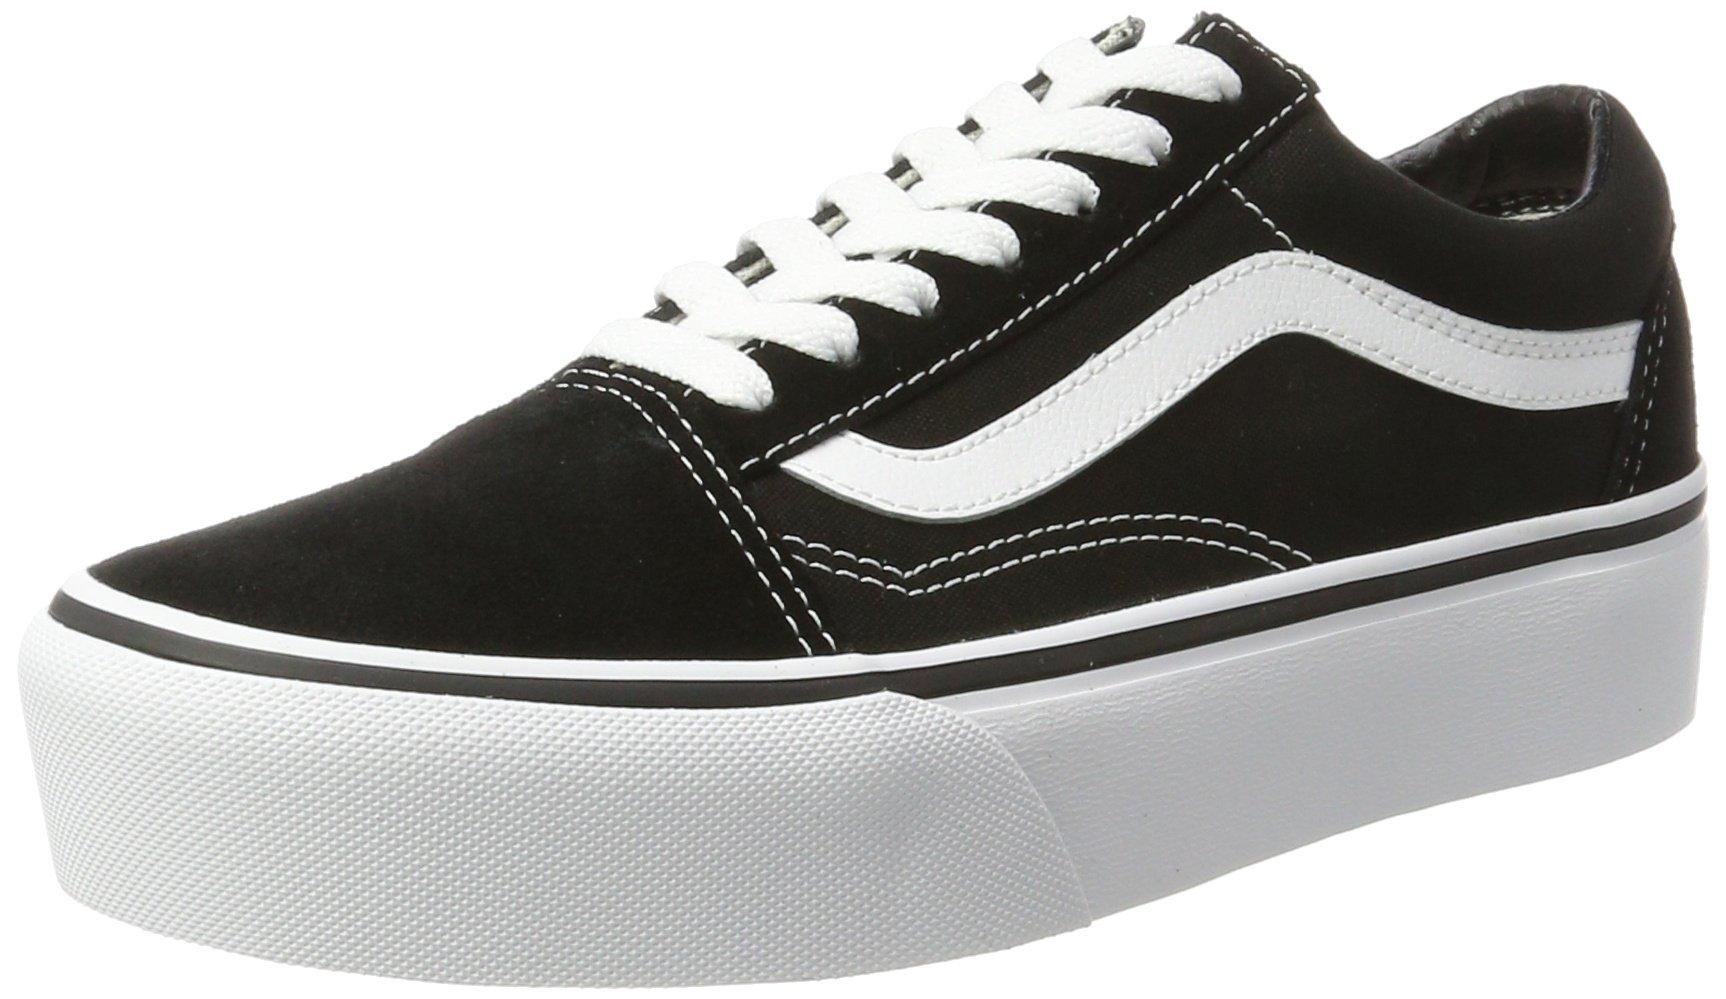 Vans Unisex Old Skool Platform Black/White Skate Shoe 6 Men US/7.5 Women US